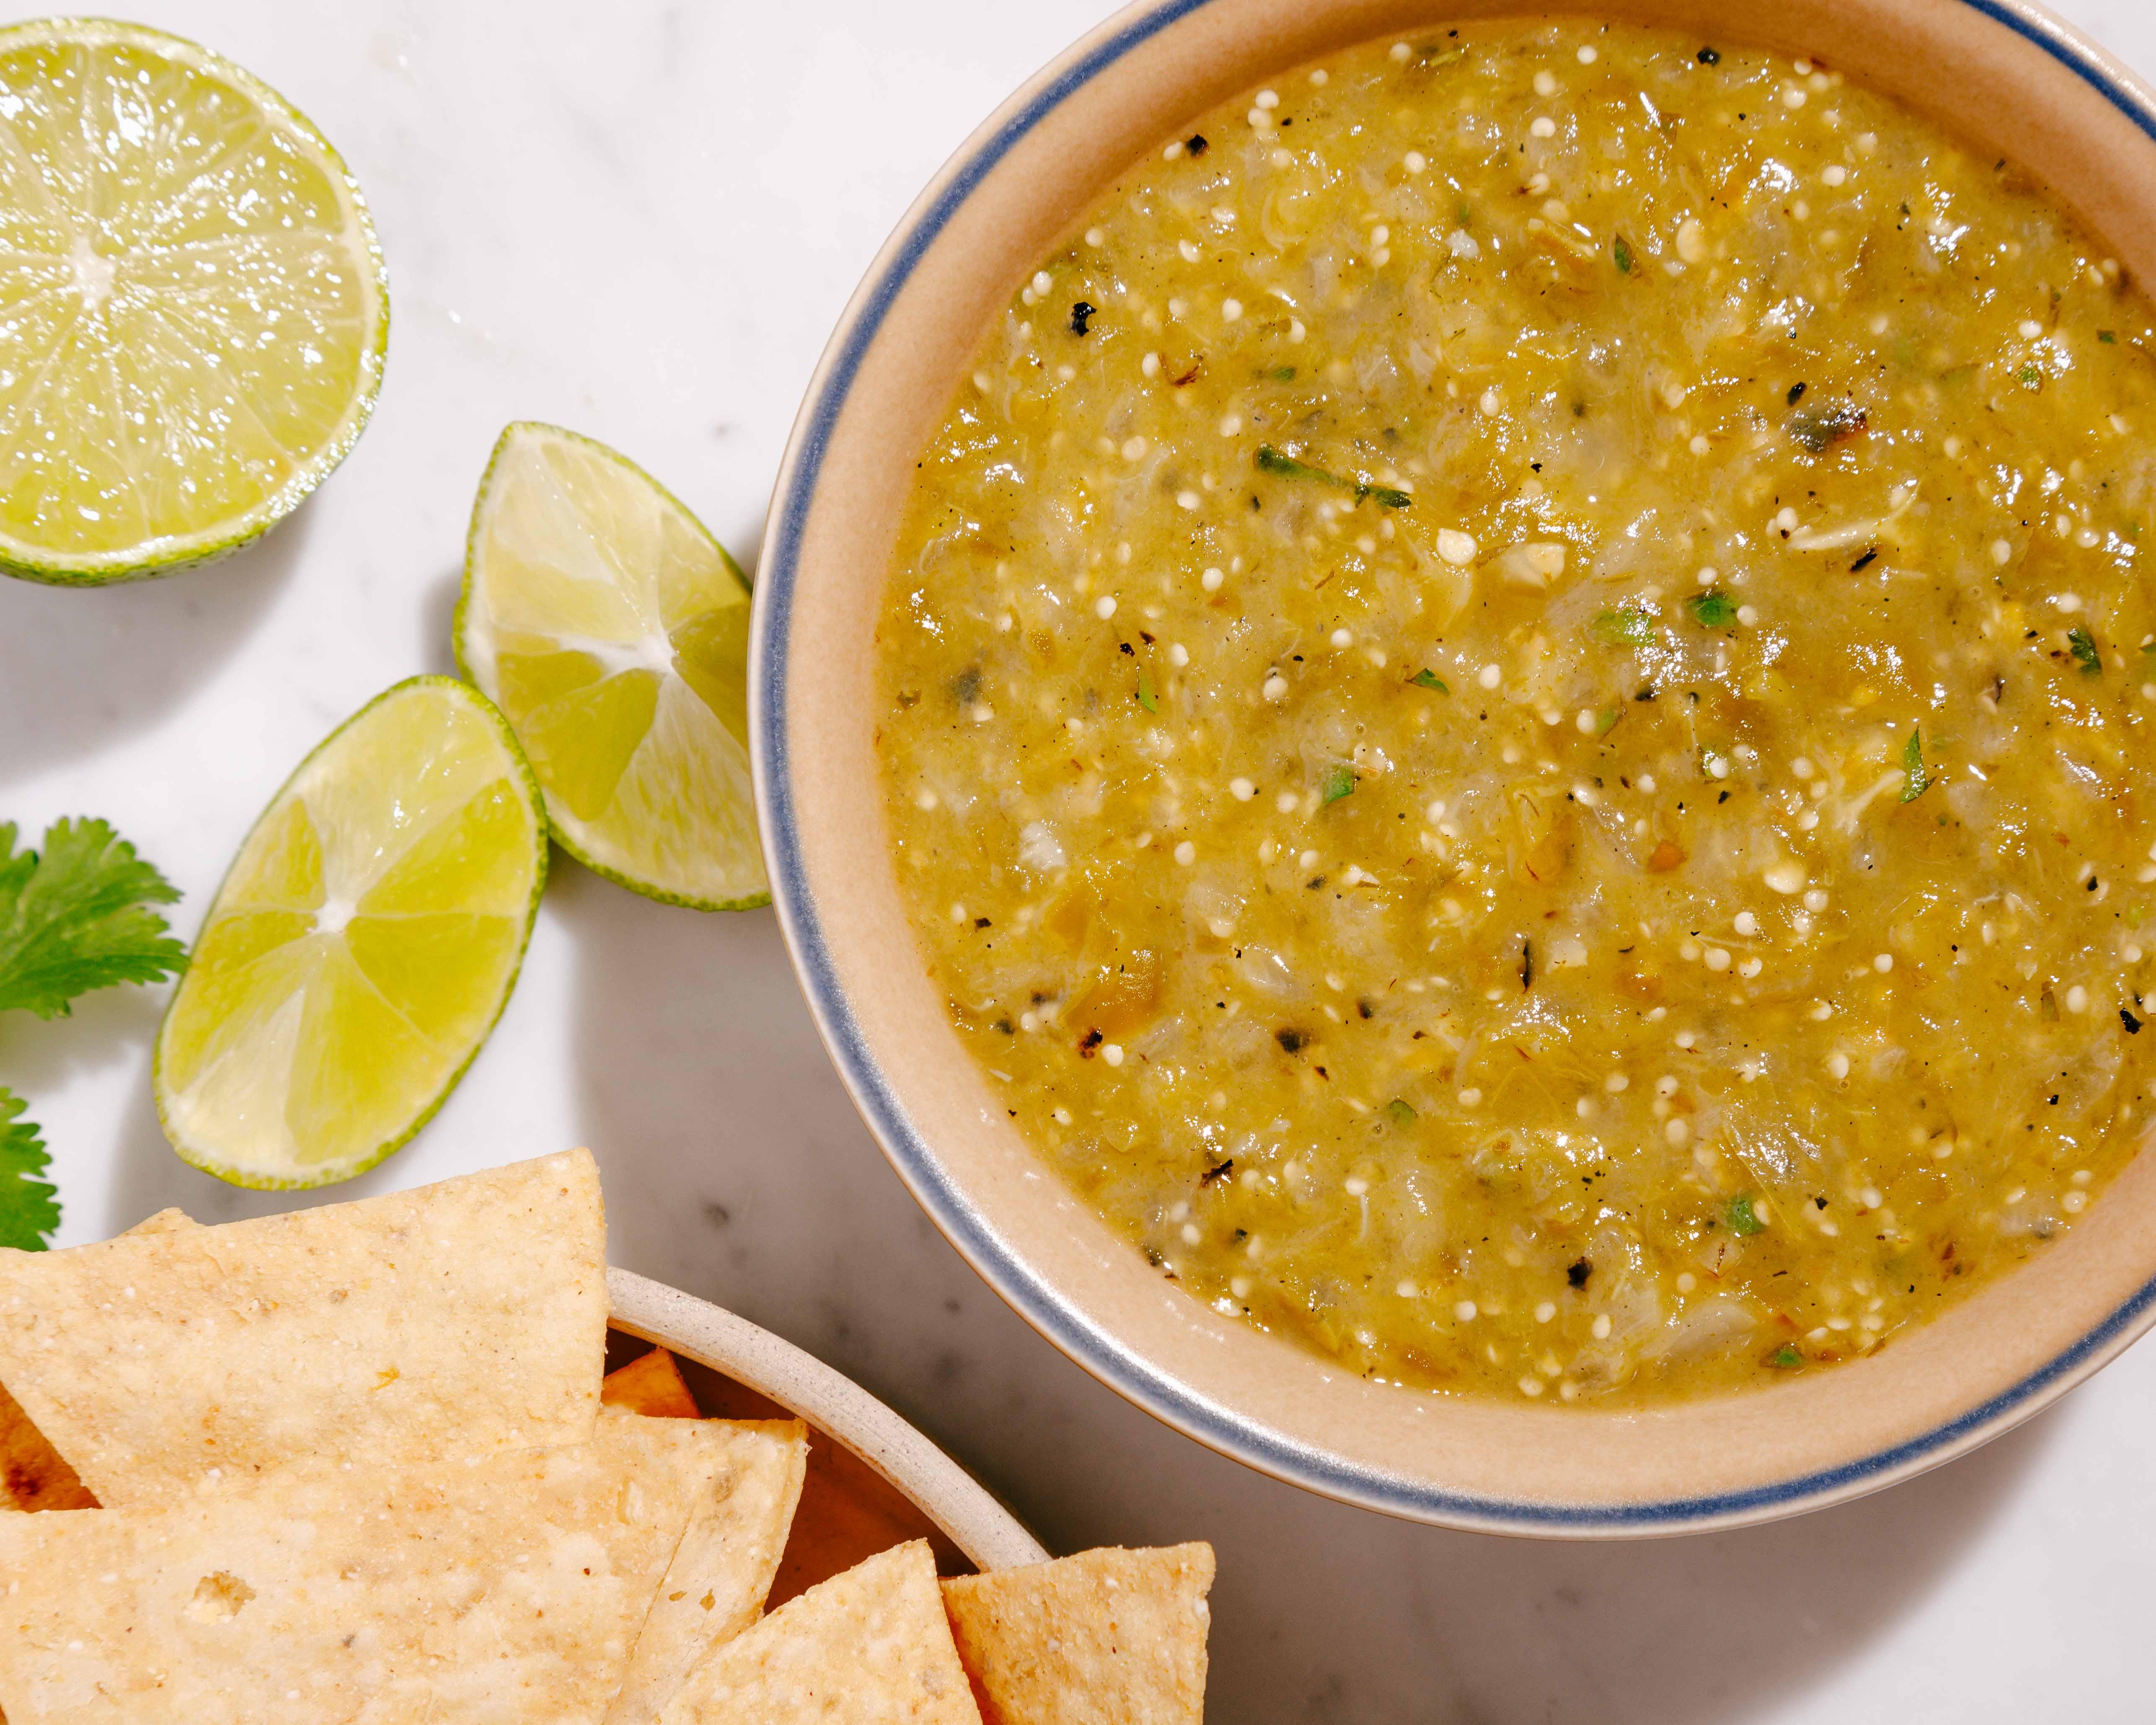 Bowl of Salsa Verde